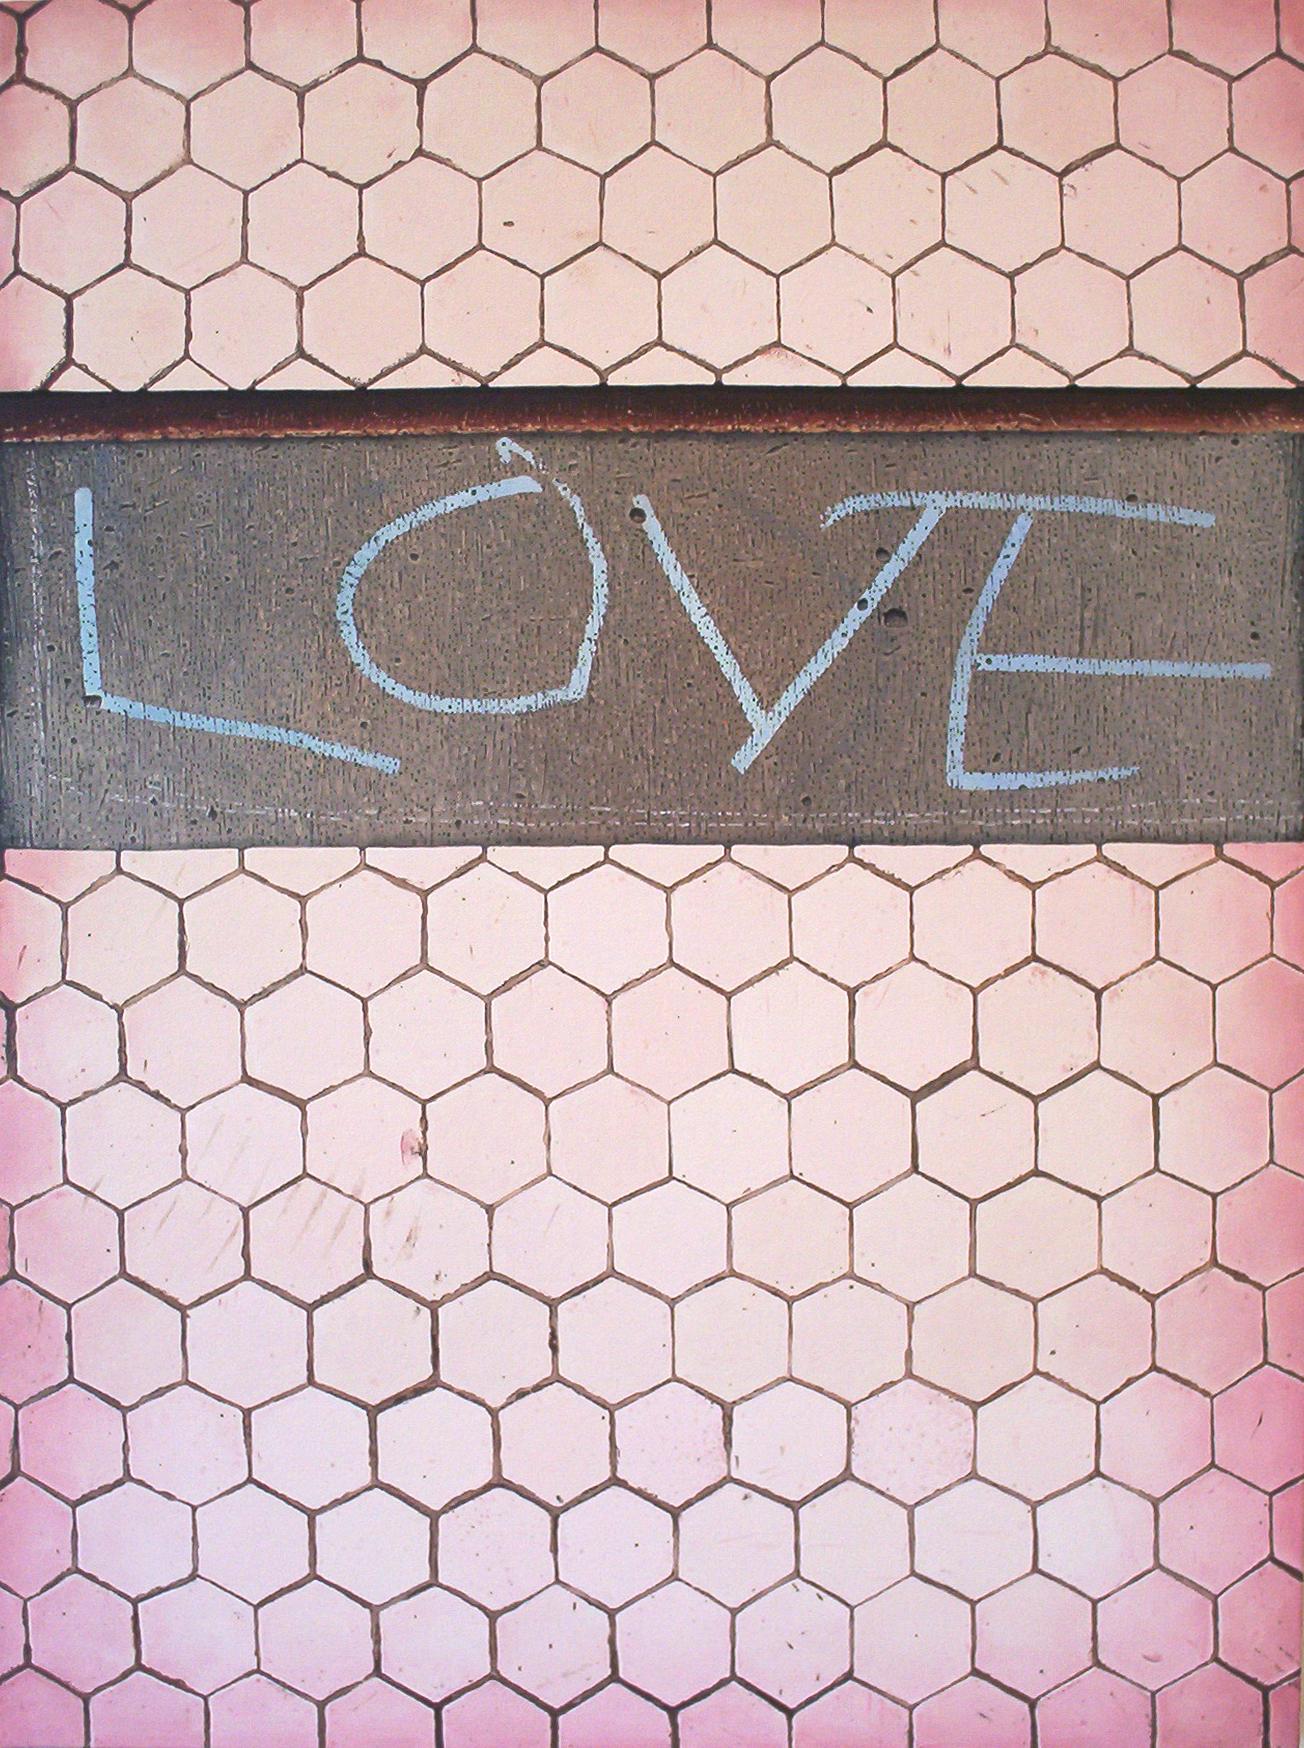 LOVE, oil on canvas, 2007